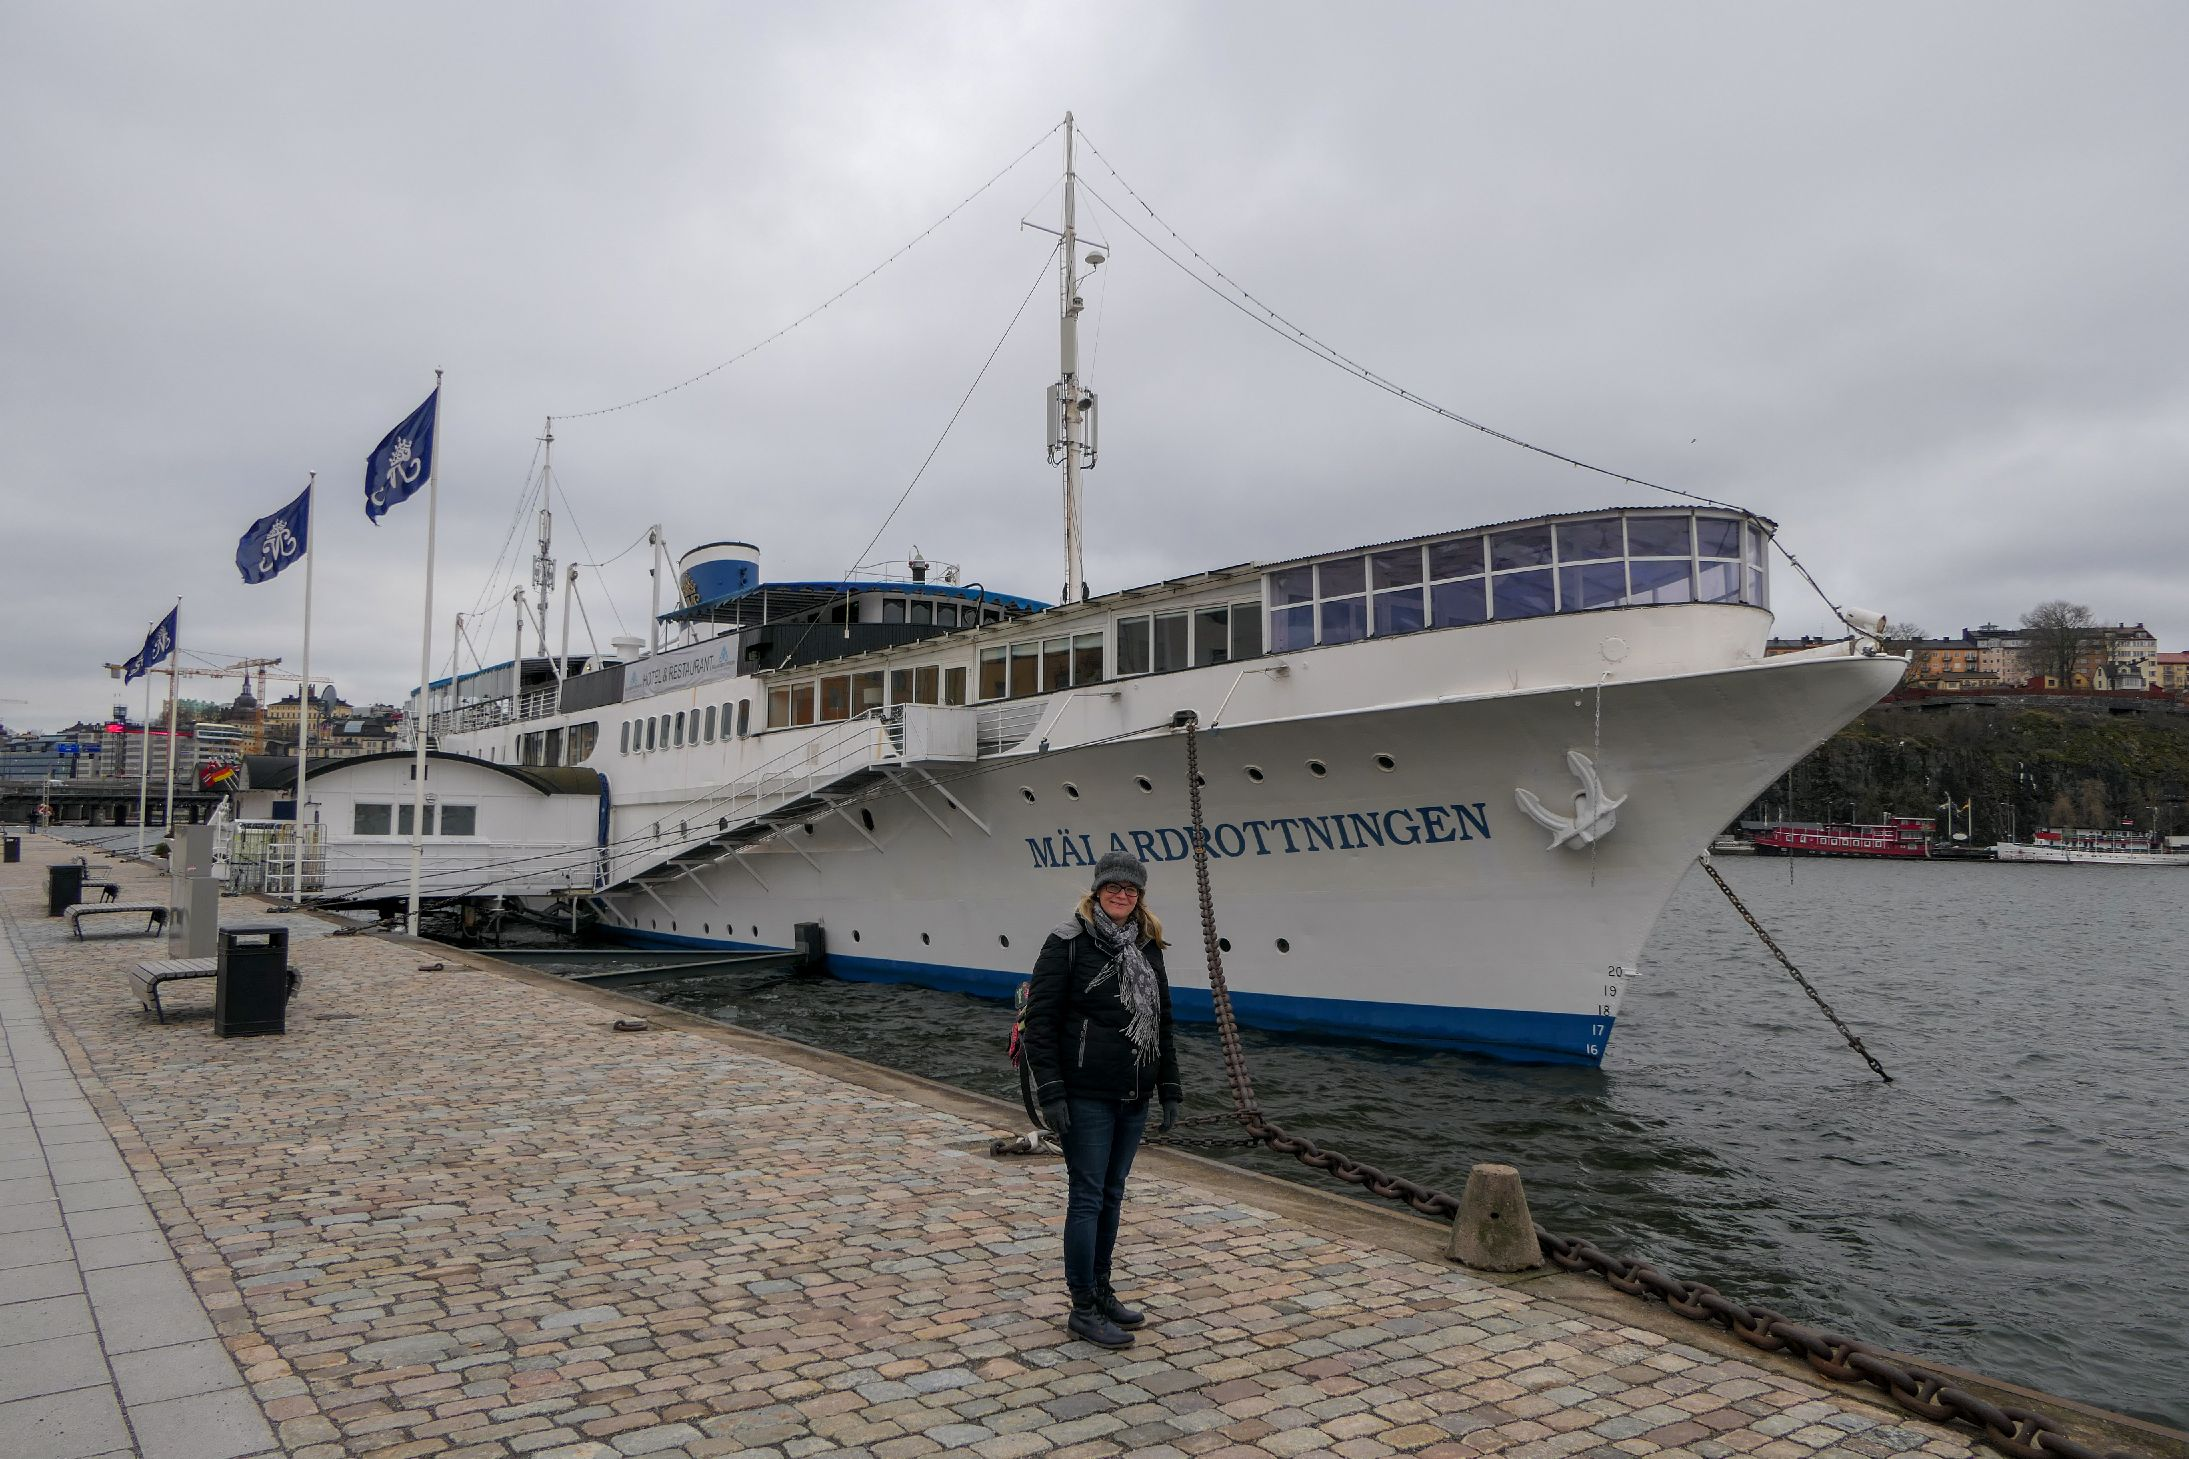 Stockholm Schweden Städtetrip Hotel Schiff Mälardrottningen Yacht